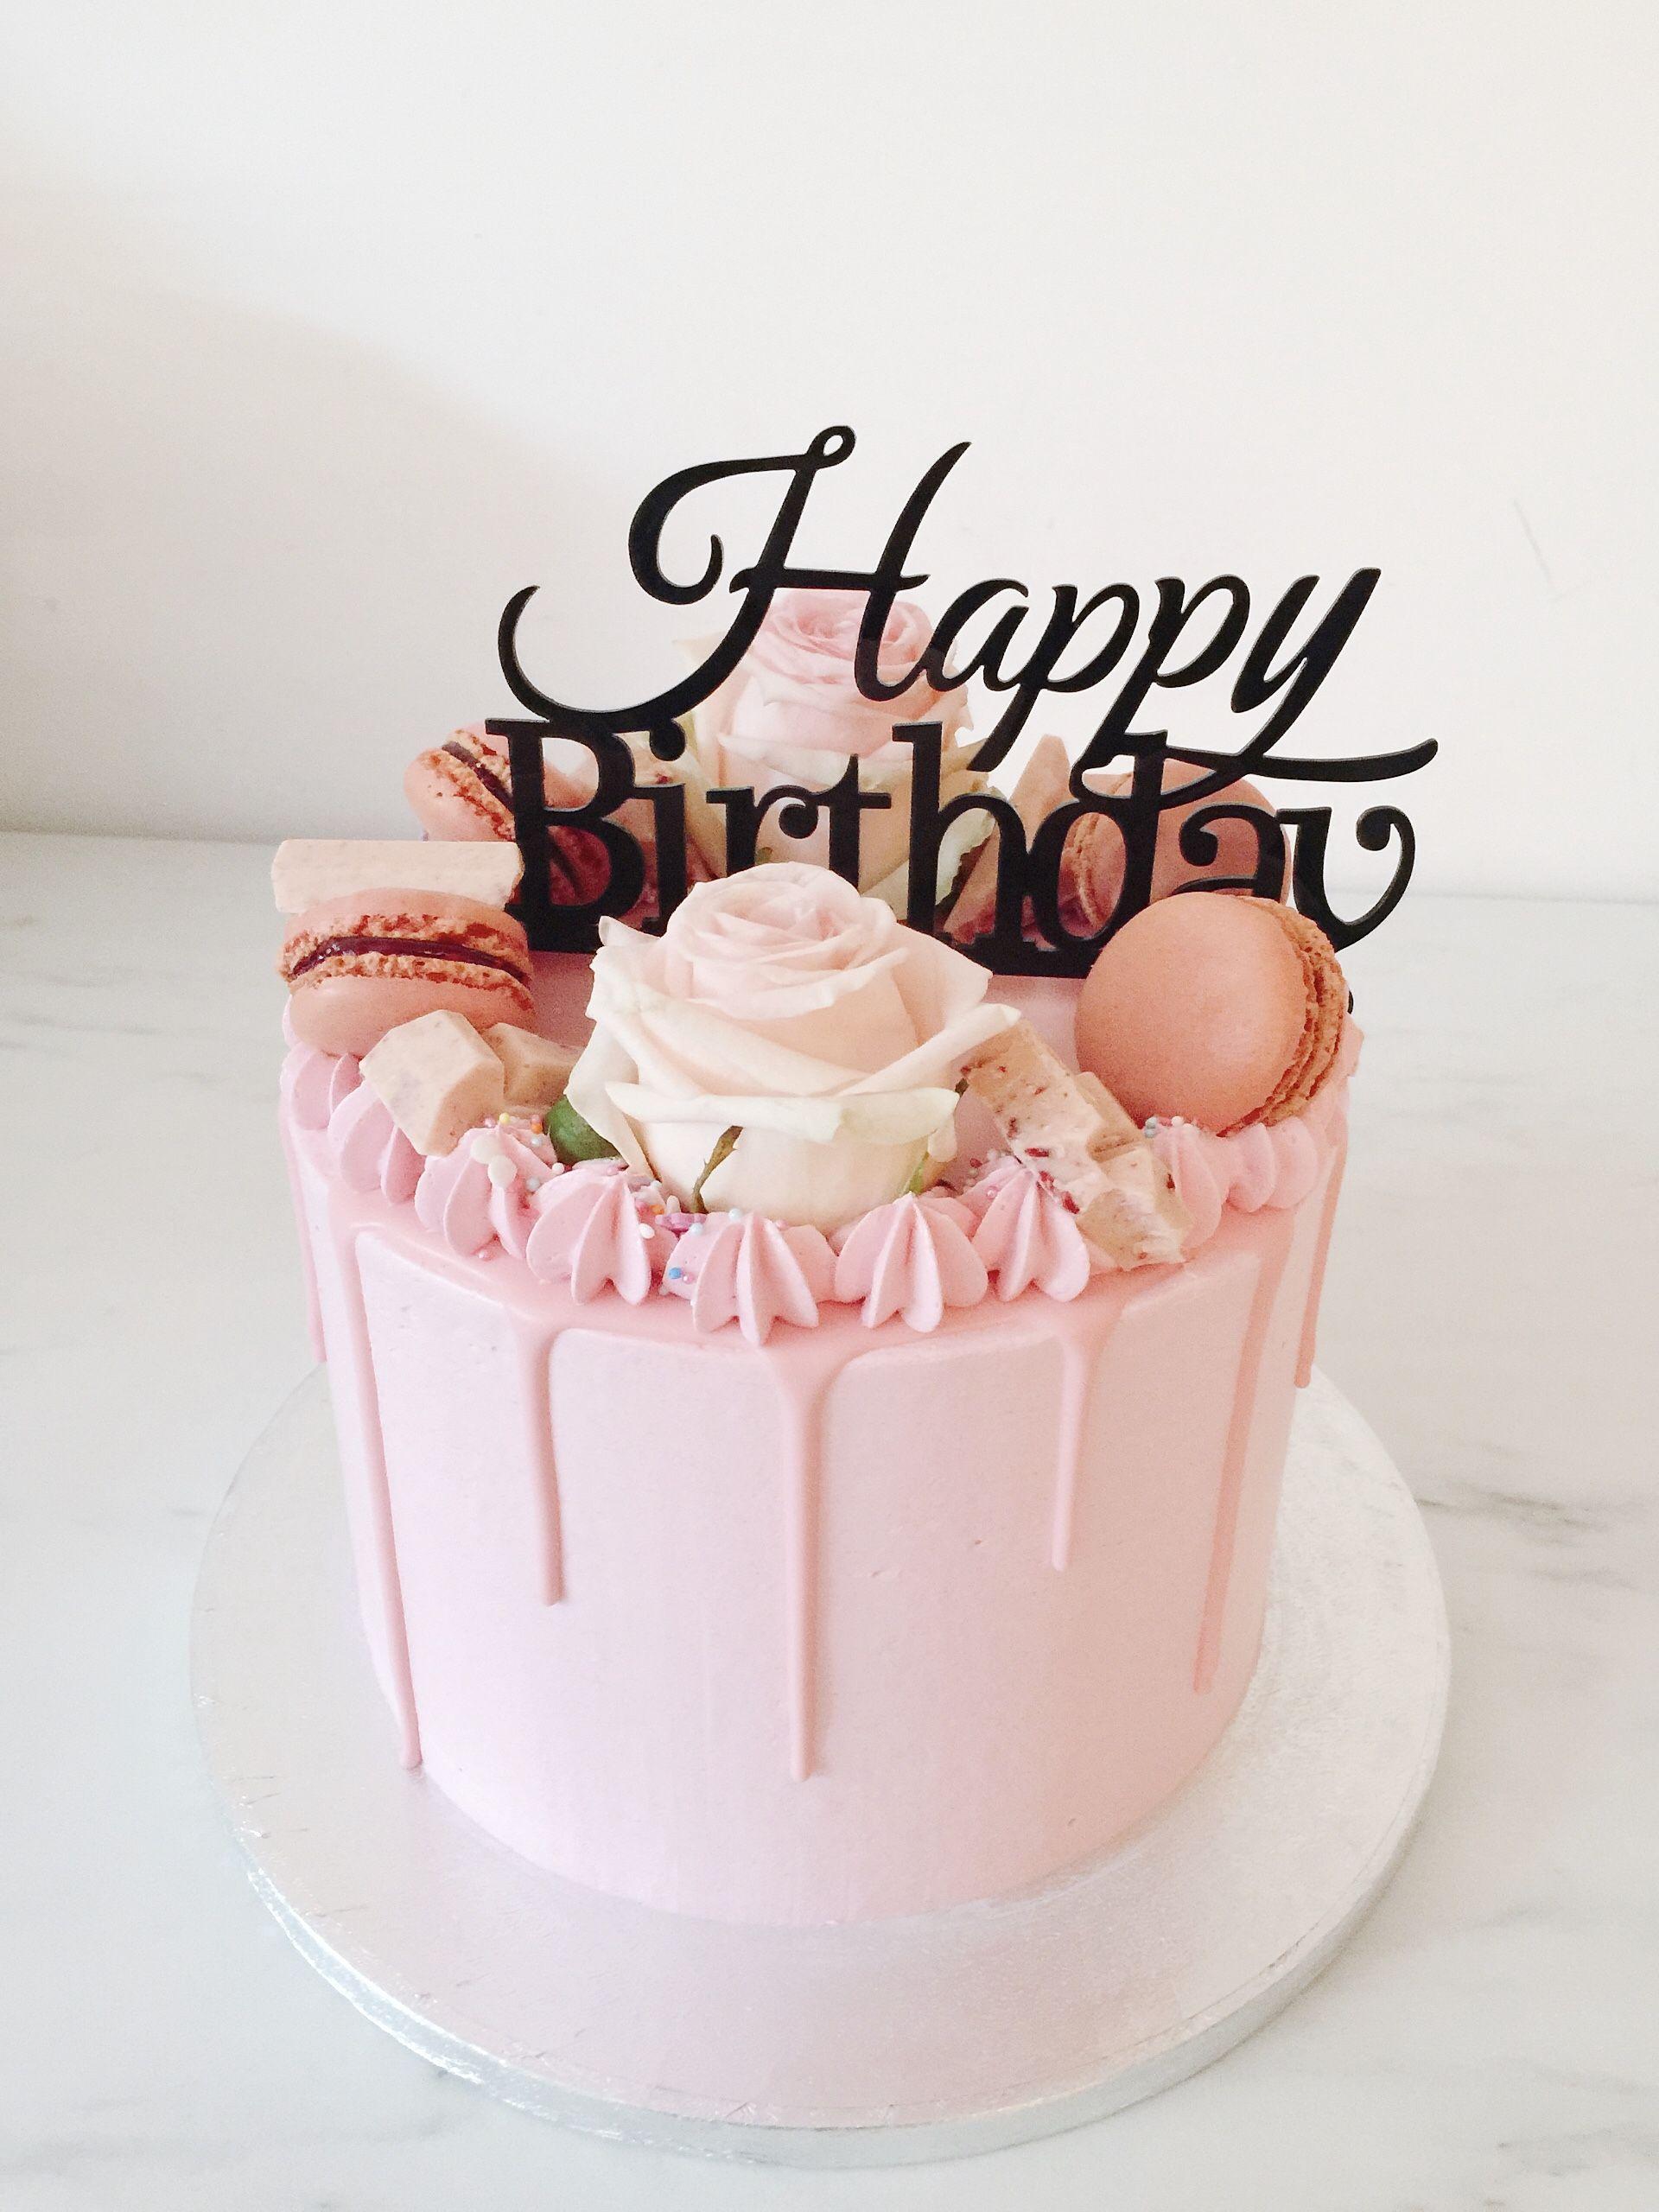 Strange Happybirthday Cake Pics Posted By Sarah Peltier Birthday Cards Printable Benkemecafe Filternl